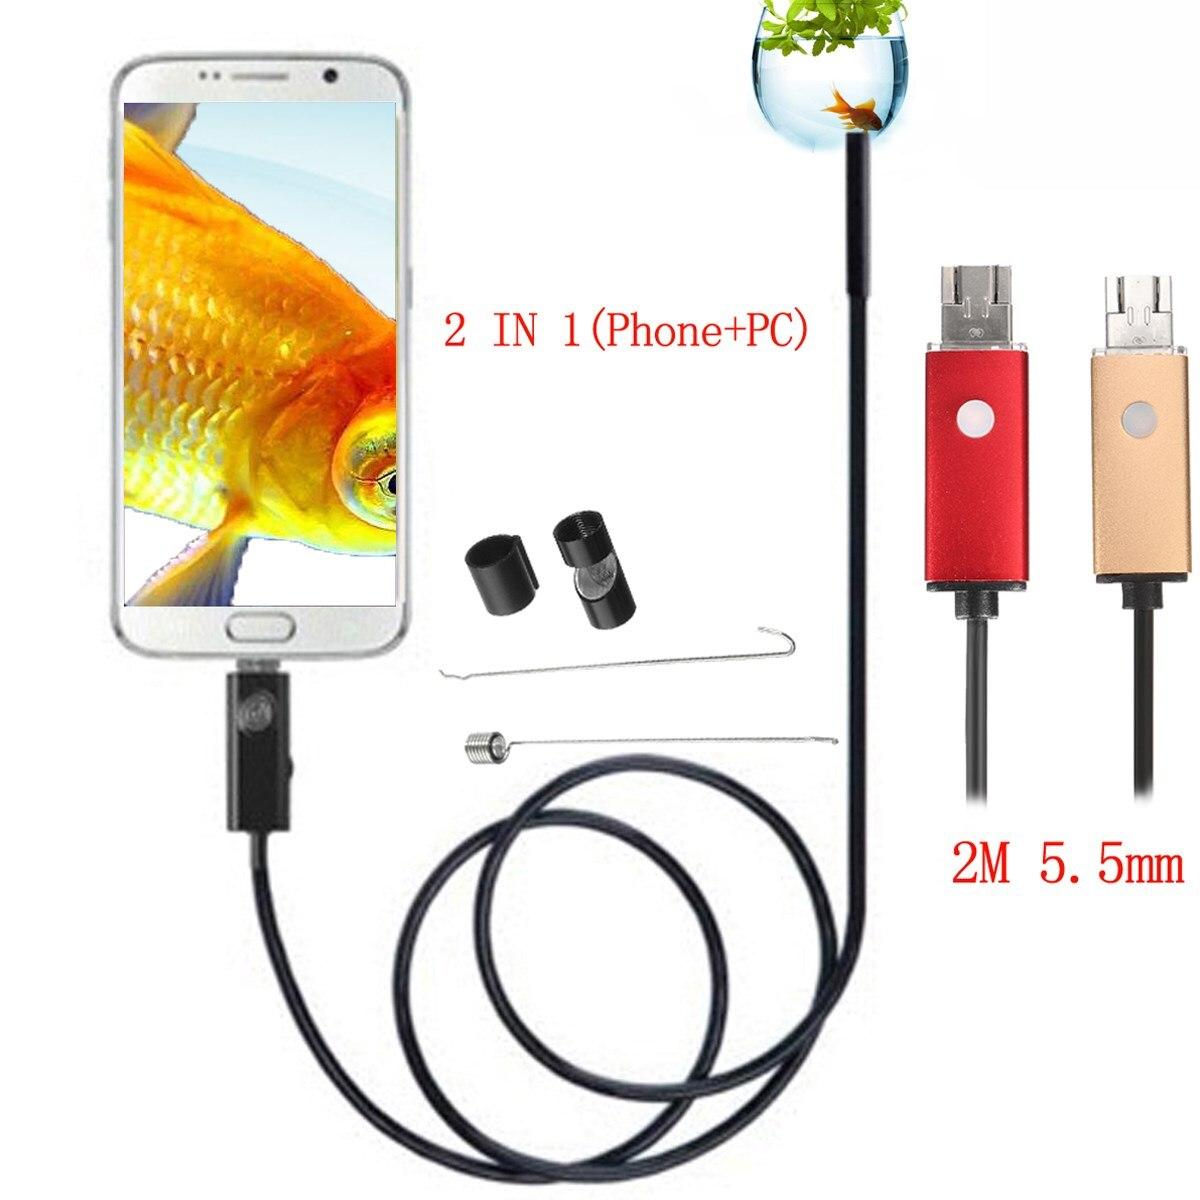 NEUE 2 In 1 2 mt 5,5mm 6 LED USB Endoskop Inspektion Kamera Wasserdicht Für Telefon PC Android Endoskop kamera